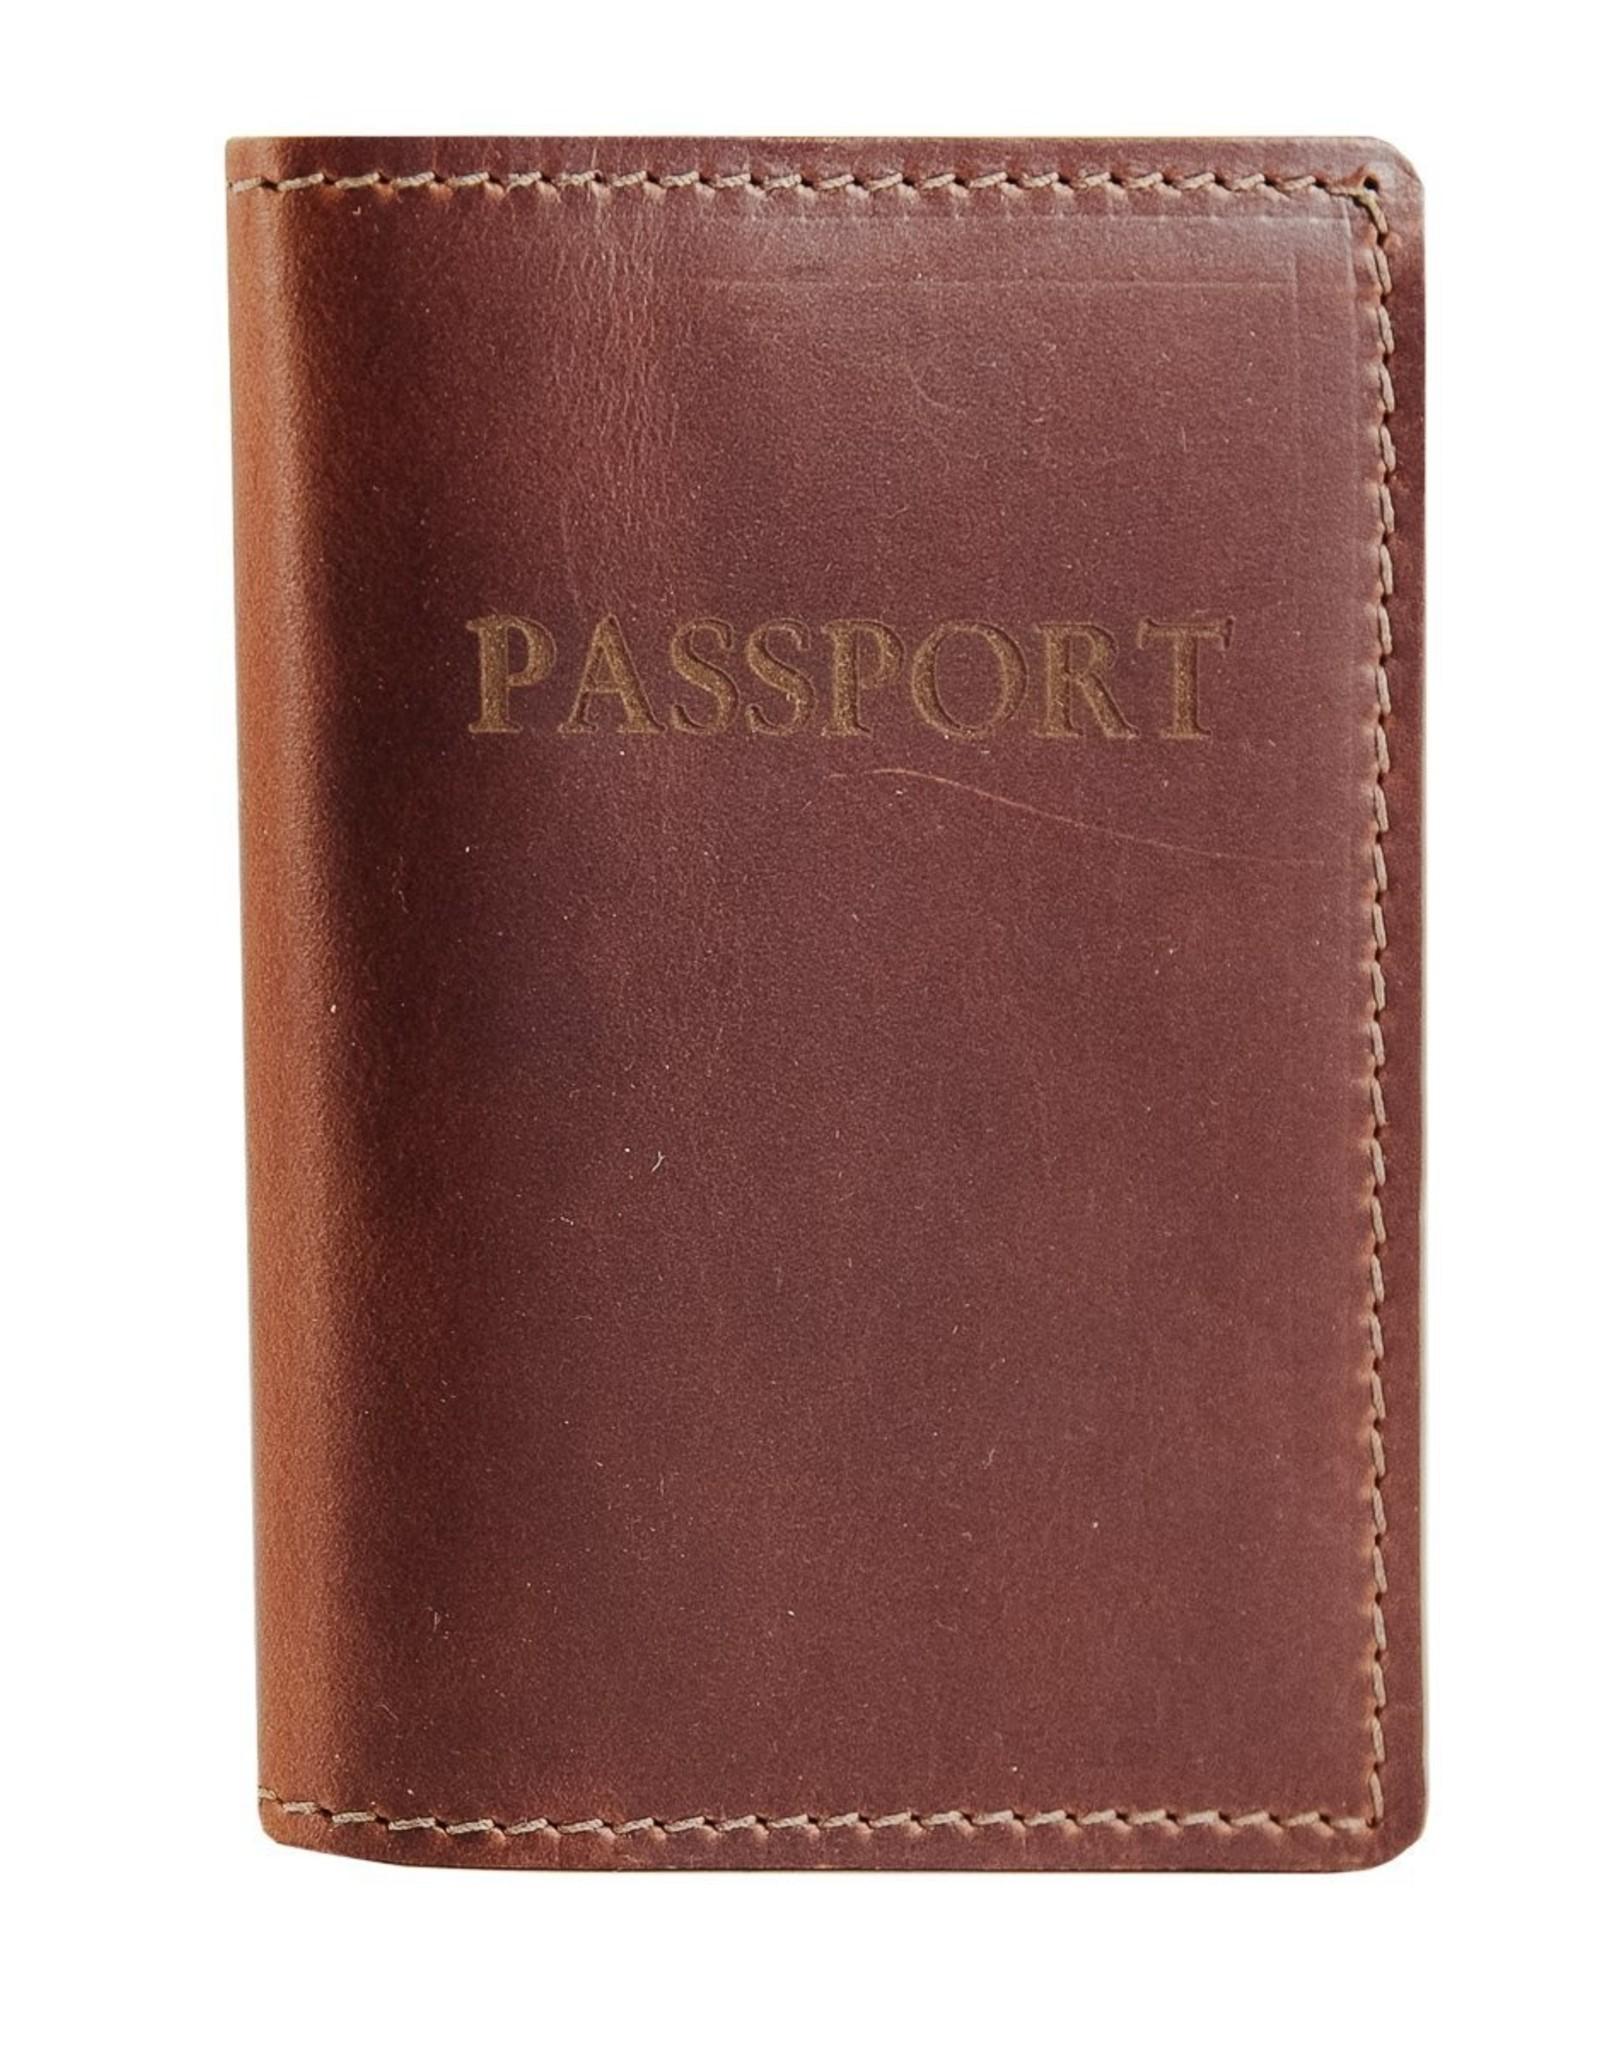 Rustico Leather Passport Cover